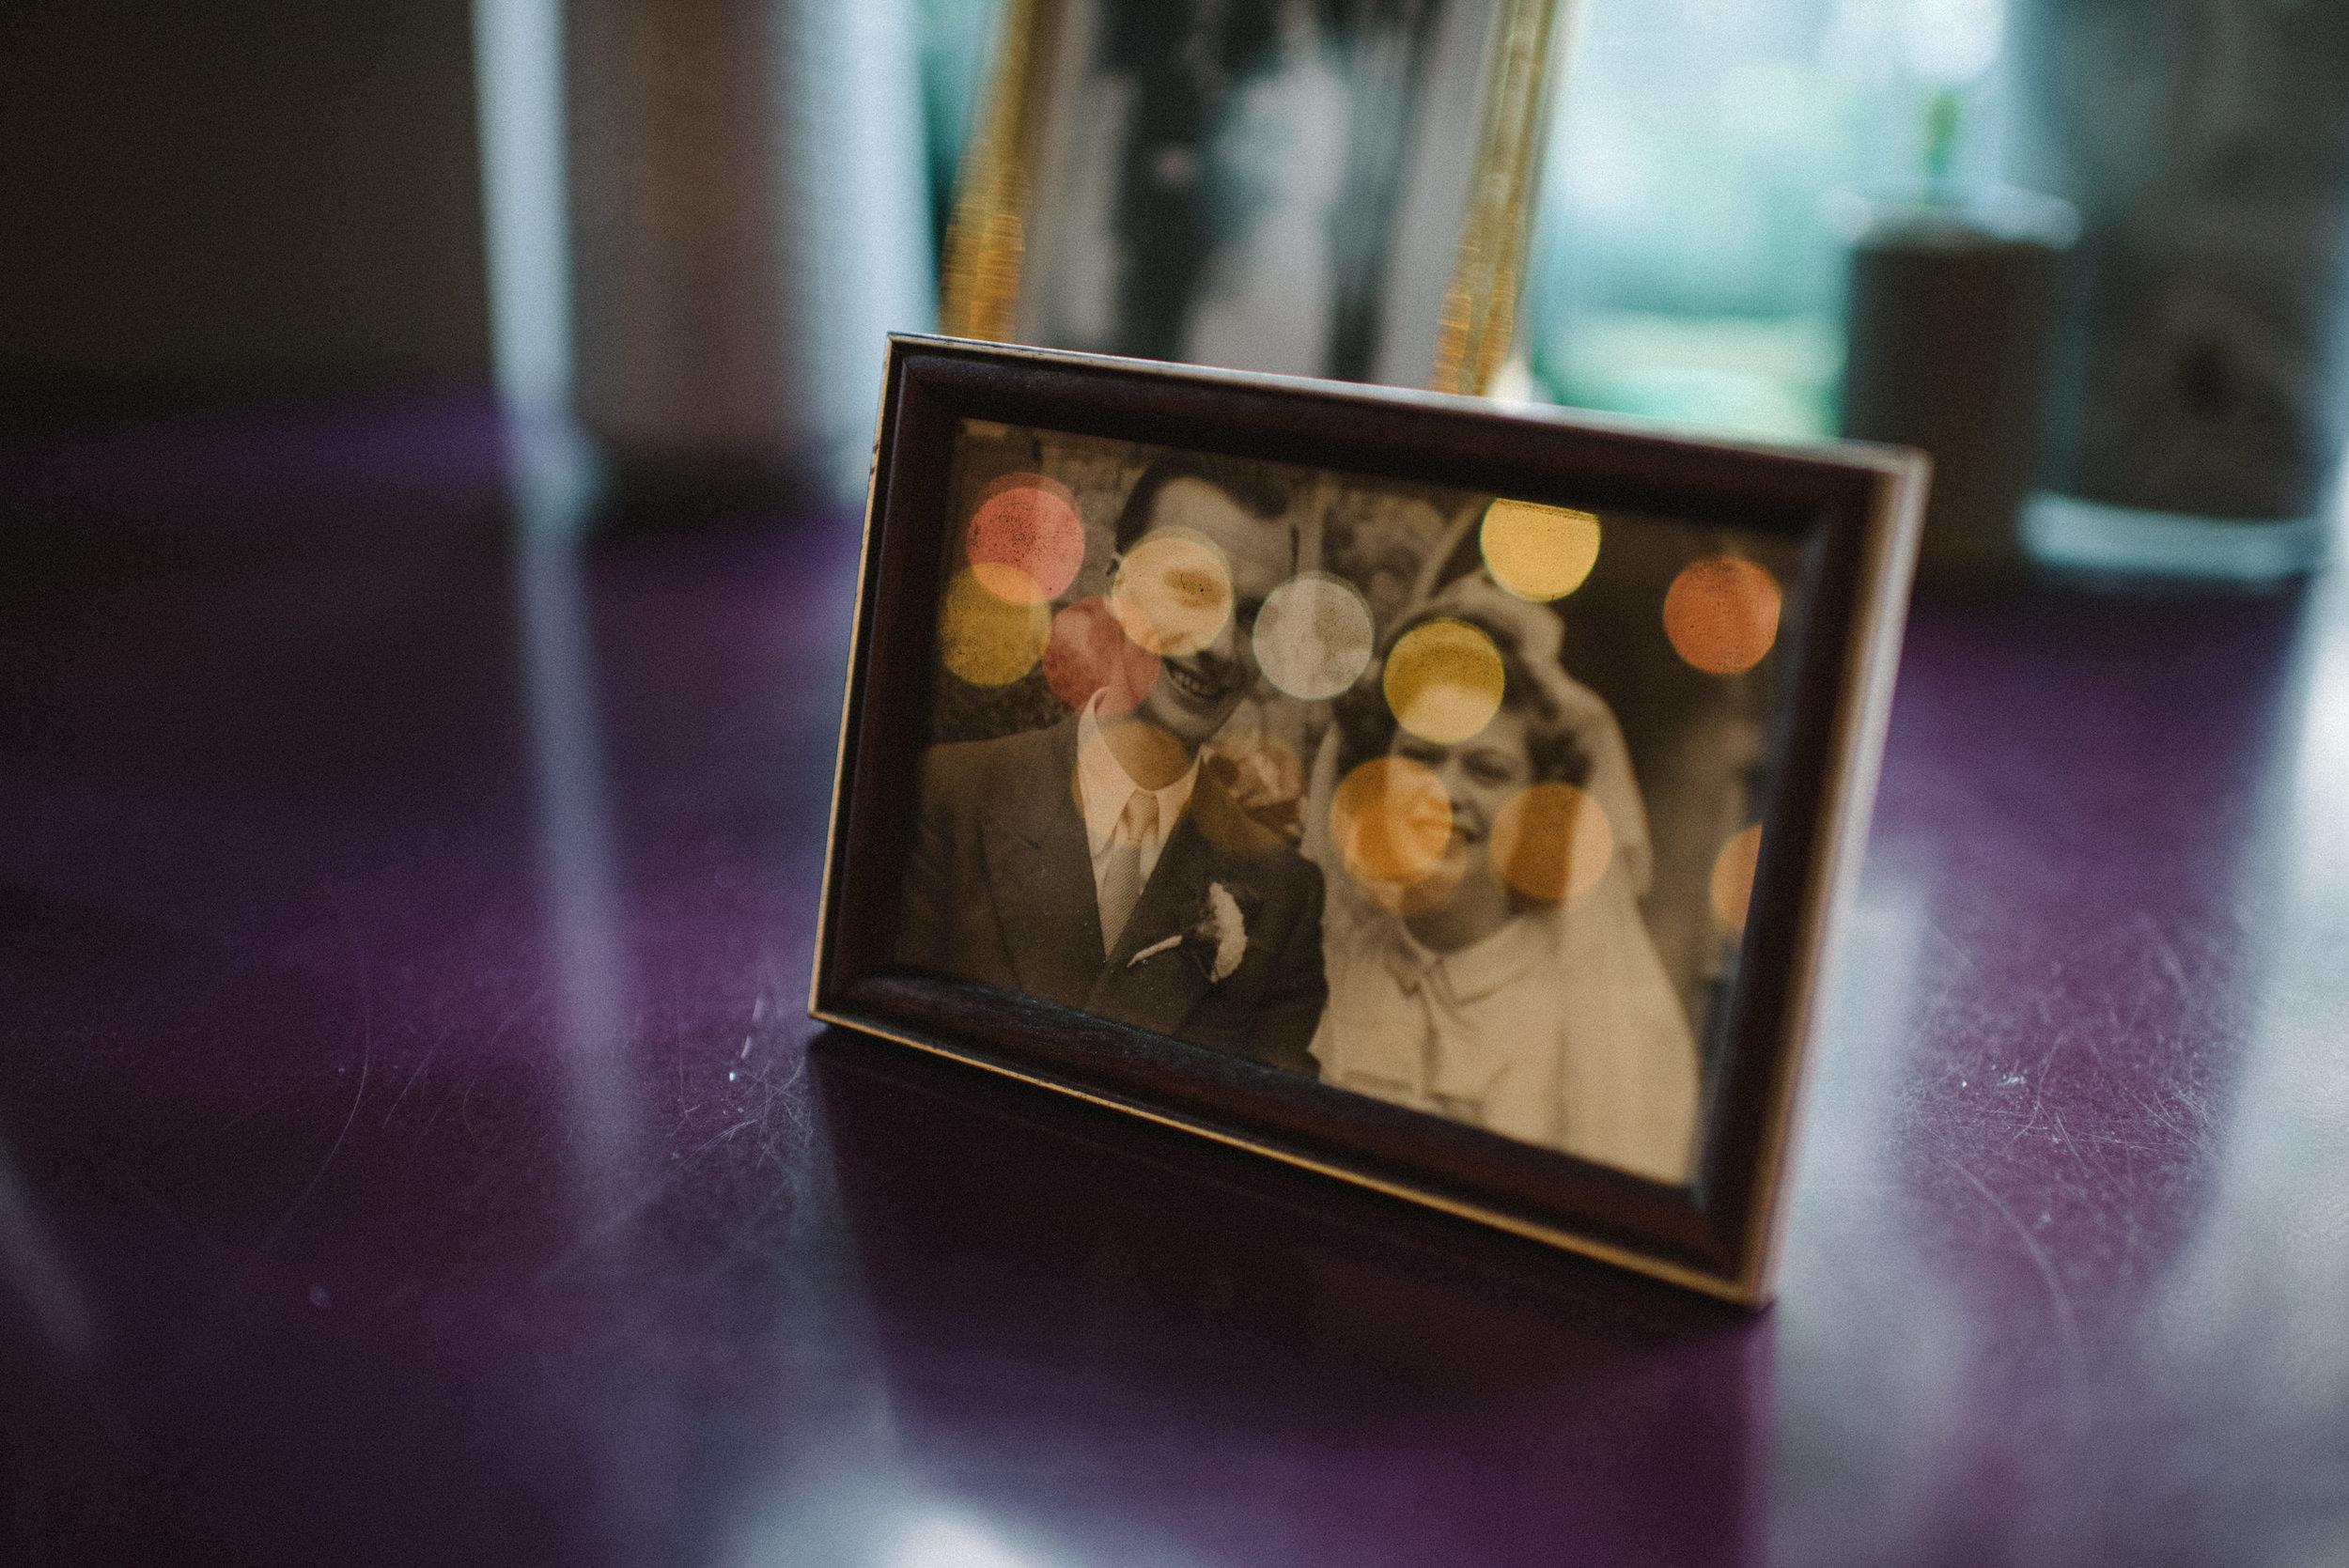 0043-LISA-DEVINE-PHOTOGRAPHY-ALTERNATIVE-WEDDING-PHOTOGRAPHY-SCOTLAND-DESTINATION-WEDDINGS-GLASGOW-WEDDINGS-COOL-WEDDINGS-STYLISH-WEDDINGS.JPG